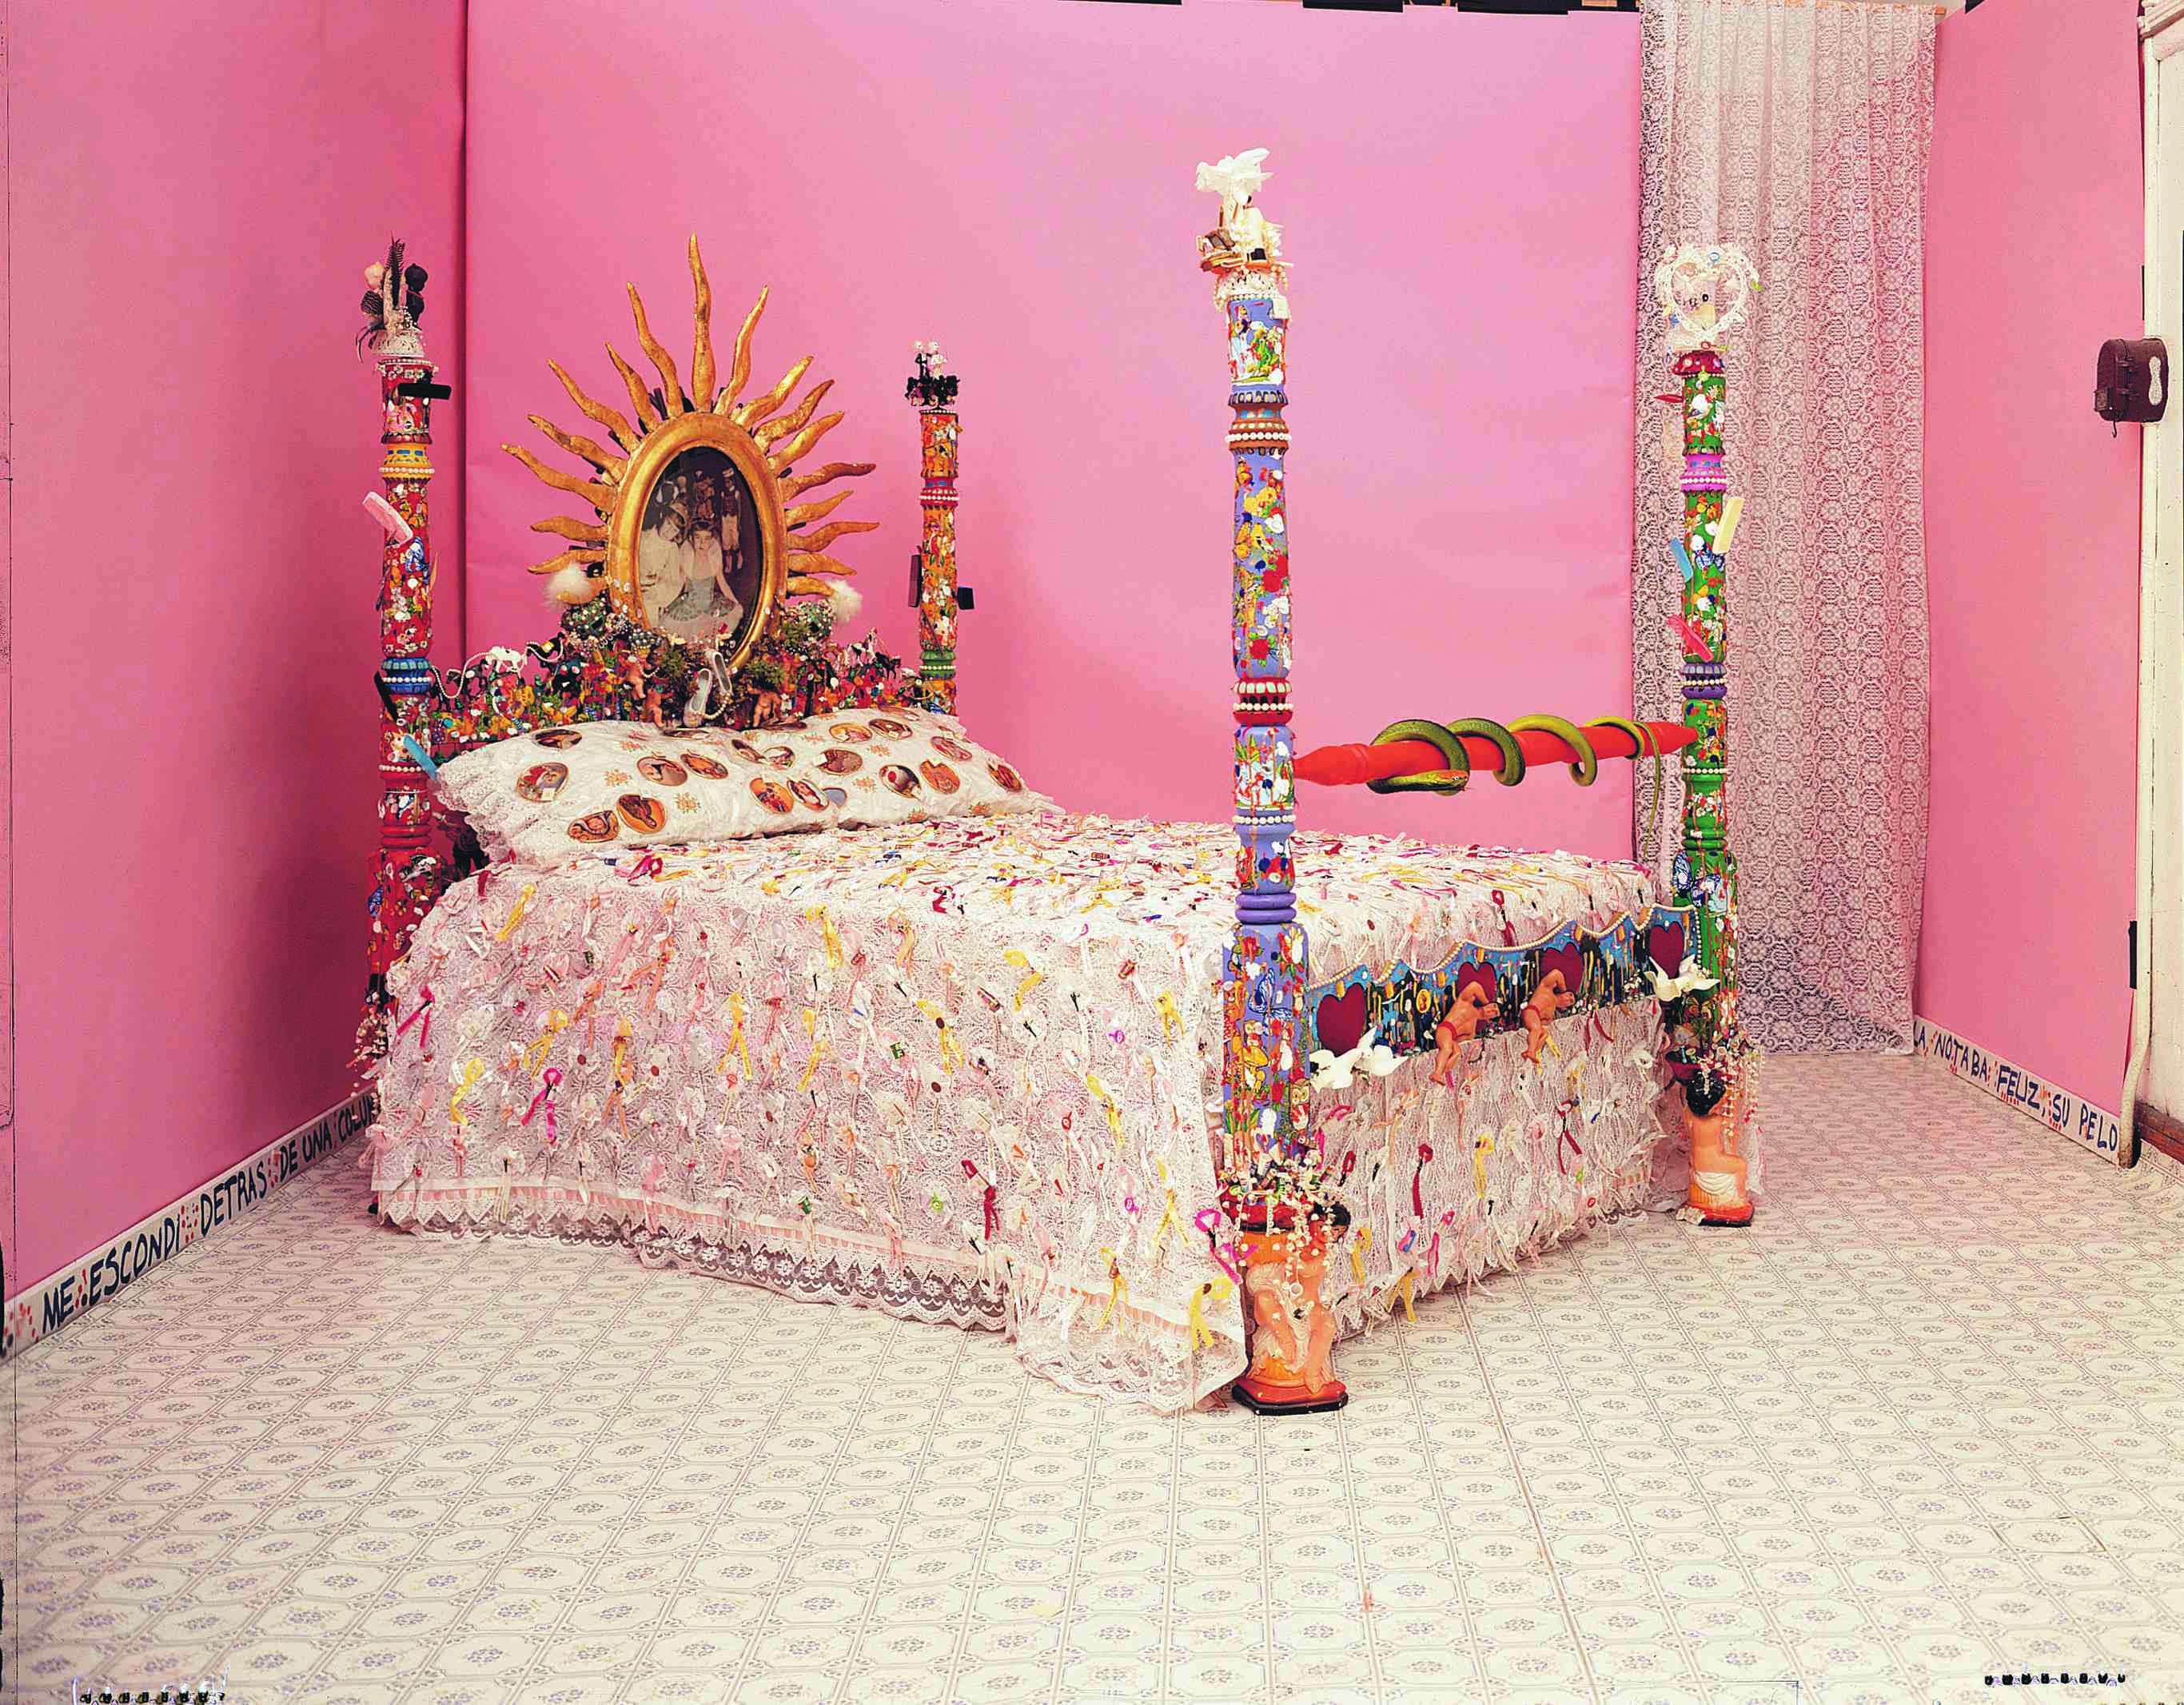 Osorio_La Cama (The Bed)[5]